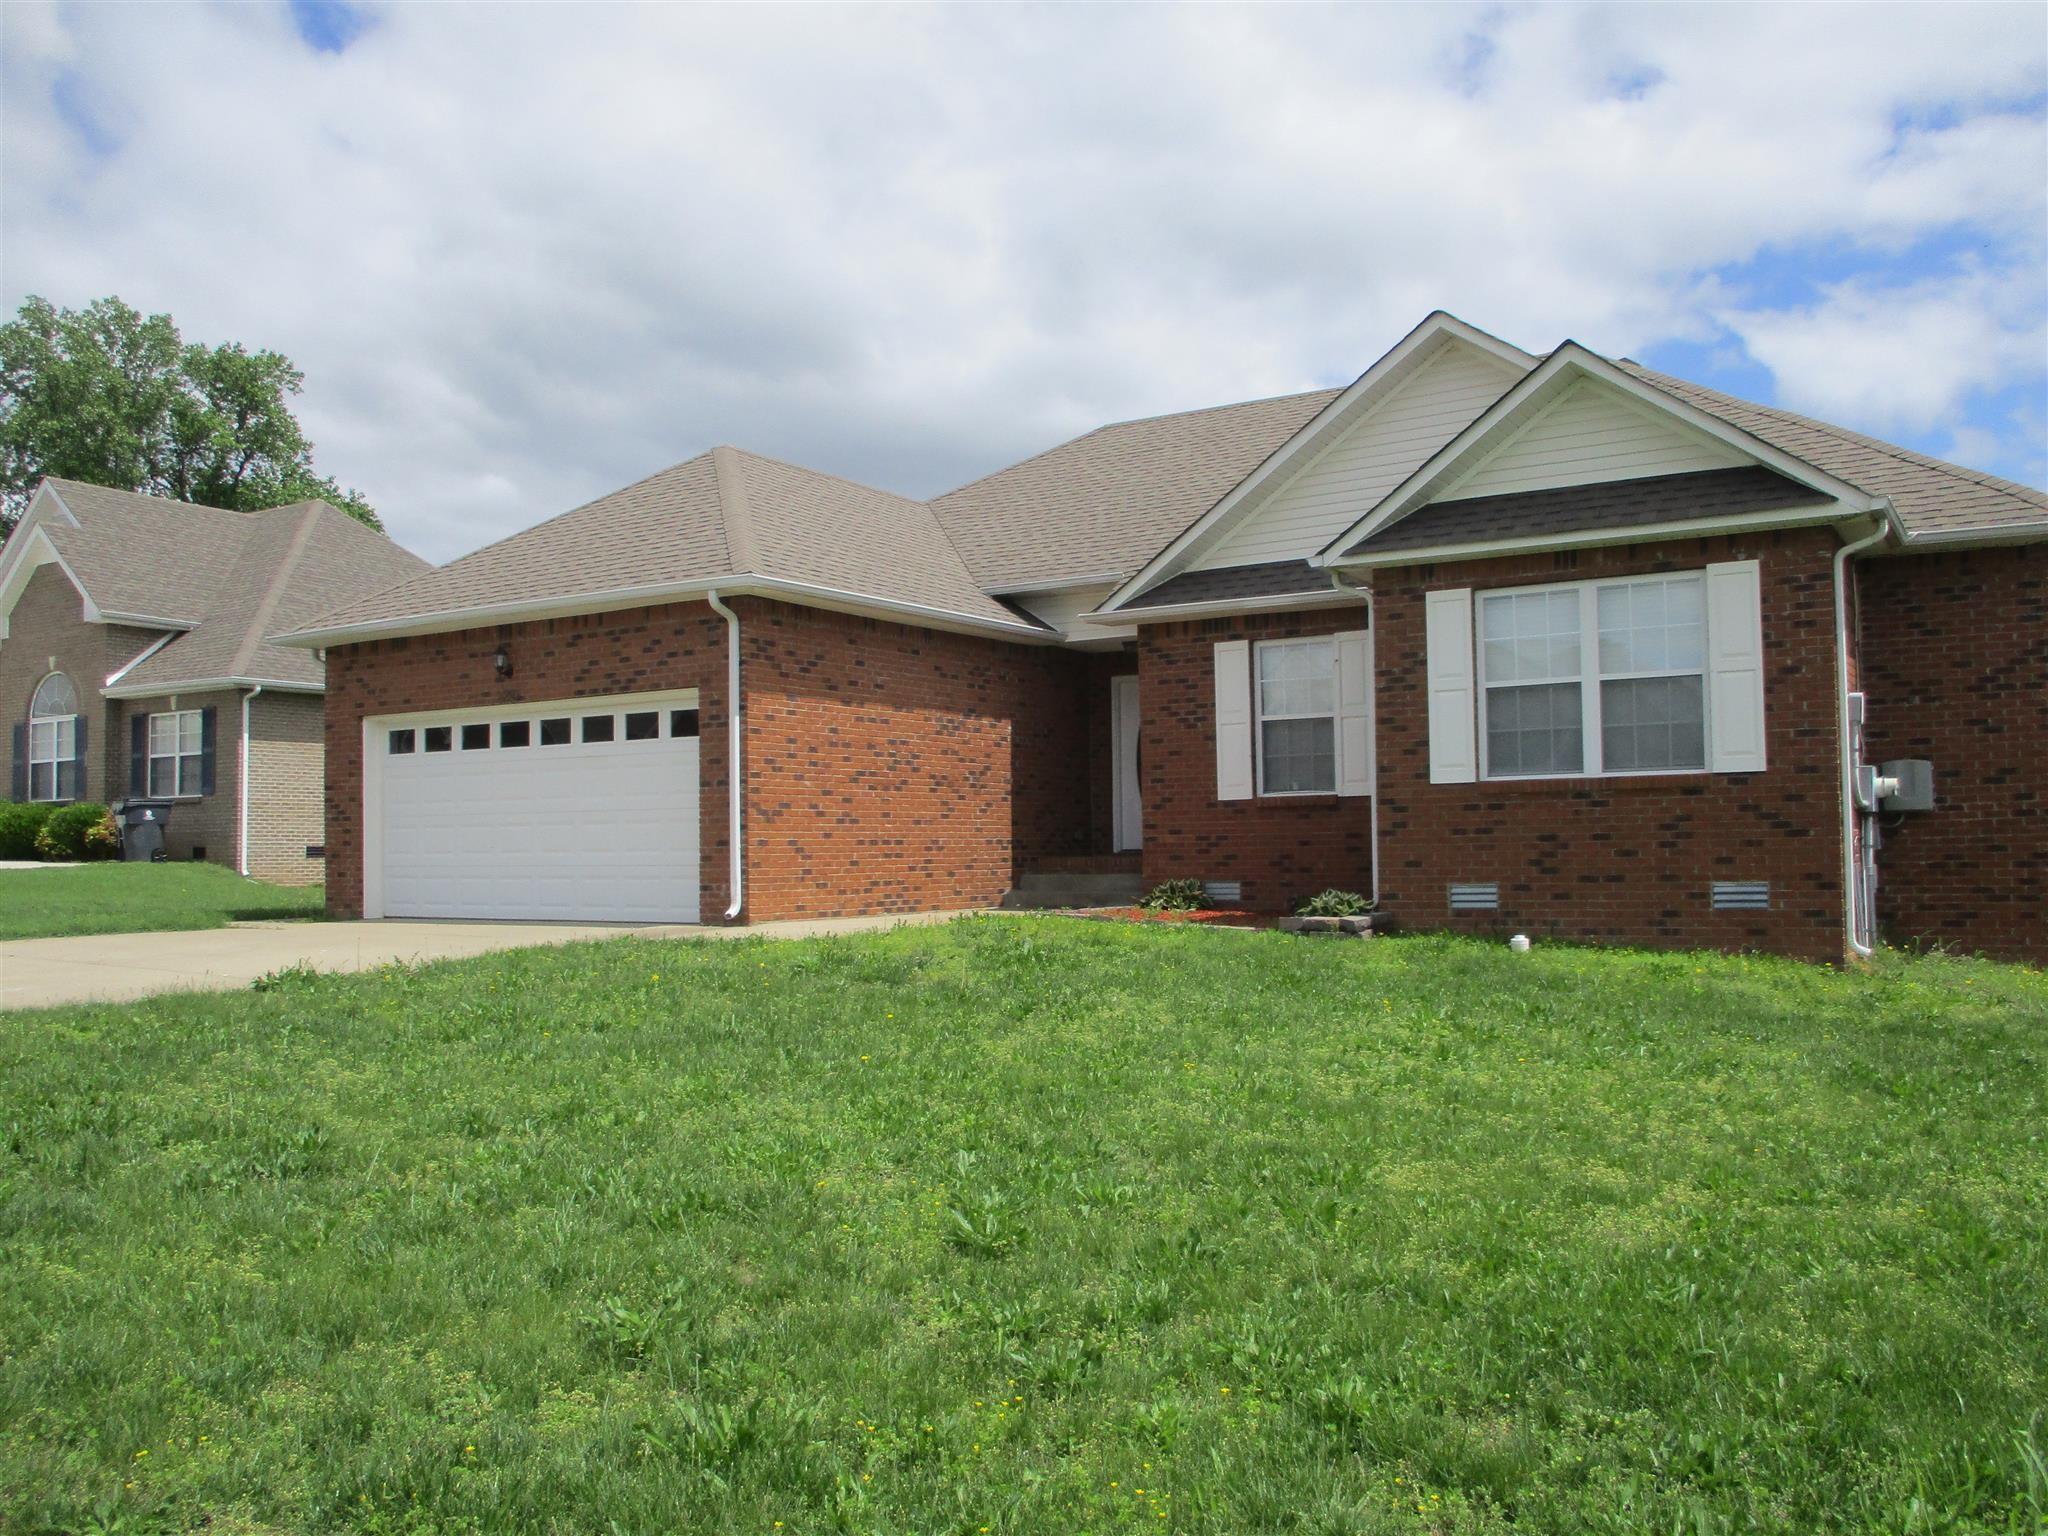 3287 Twelve Oaks Blvd Property Photo - Clarksville, TN real estate listing